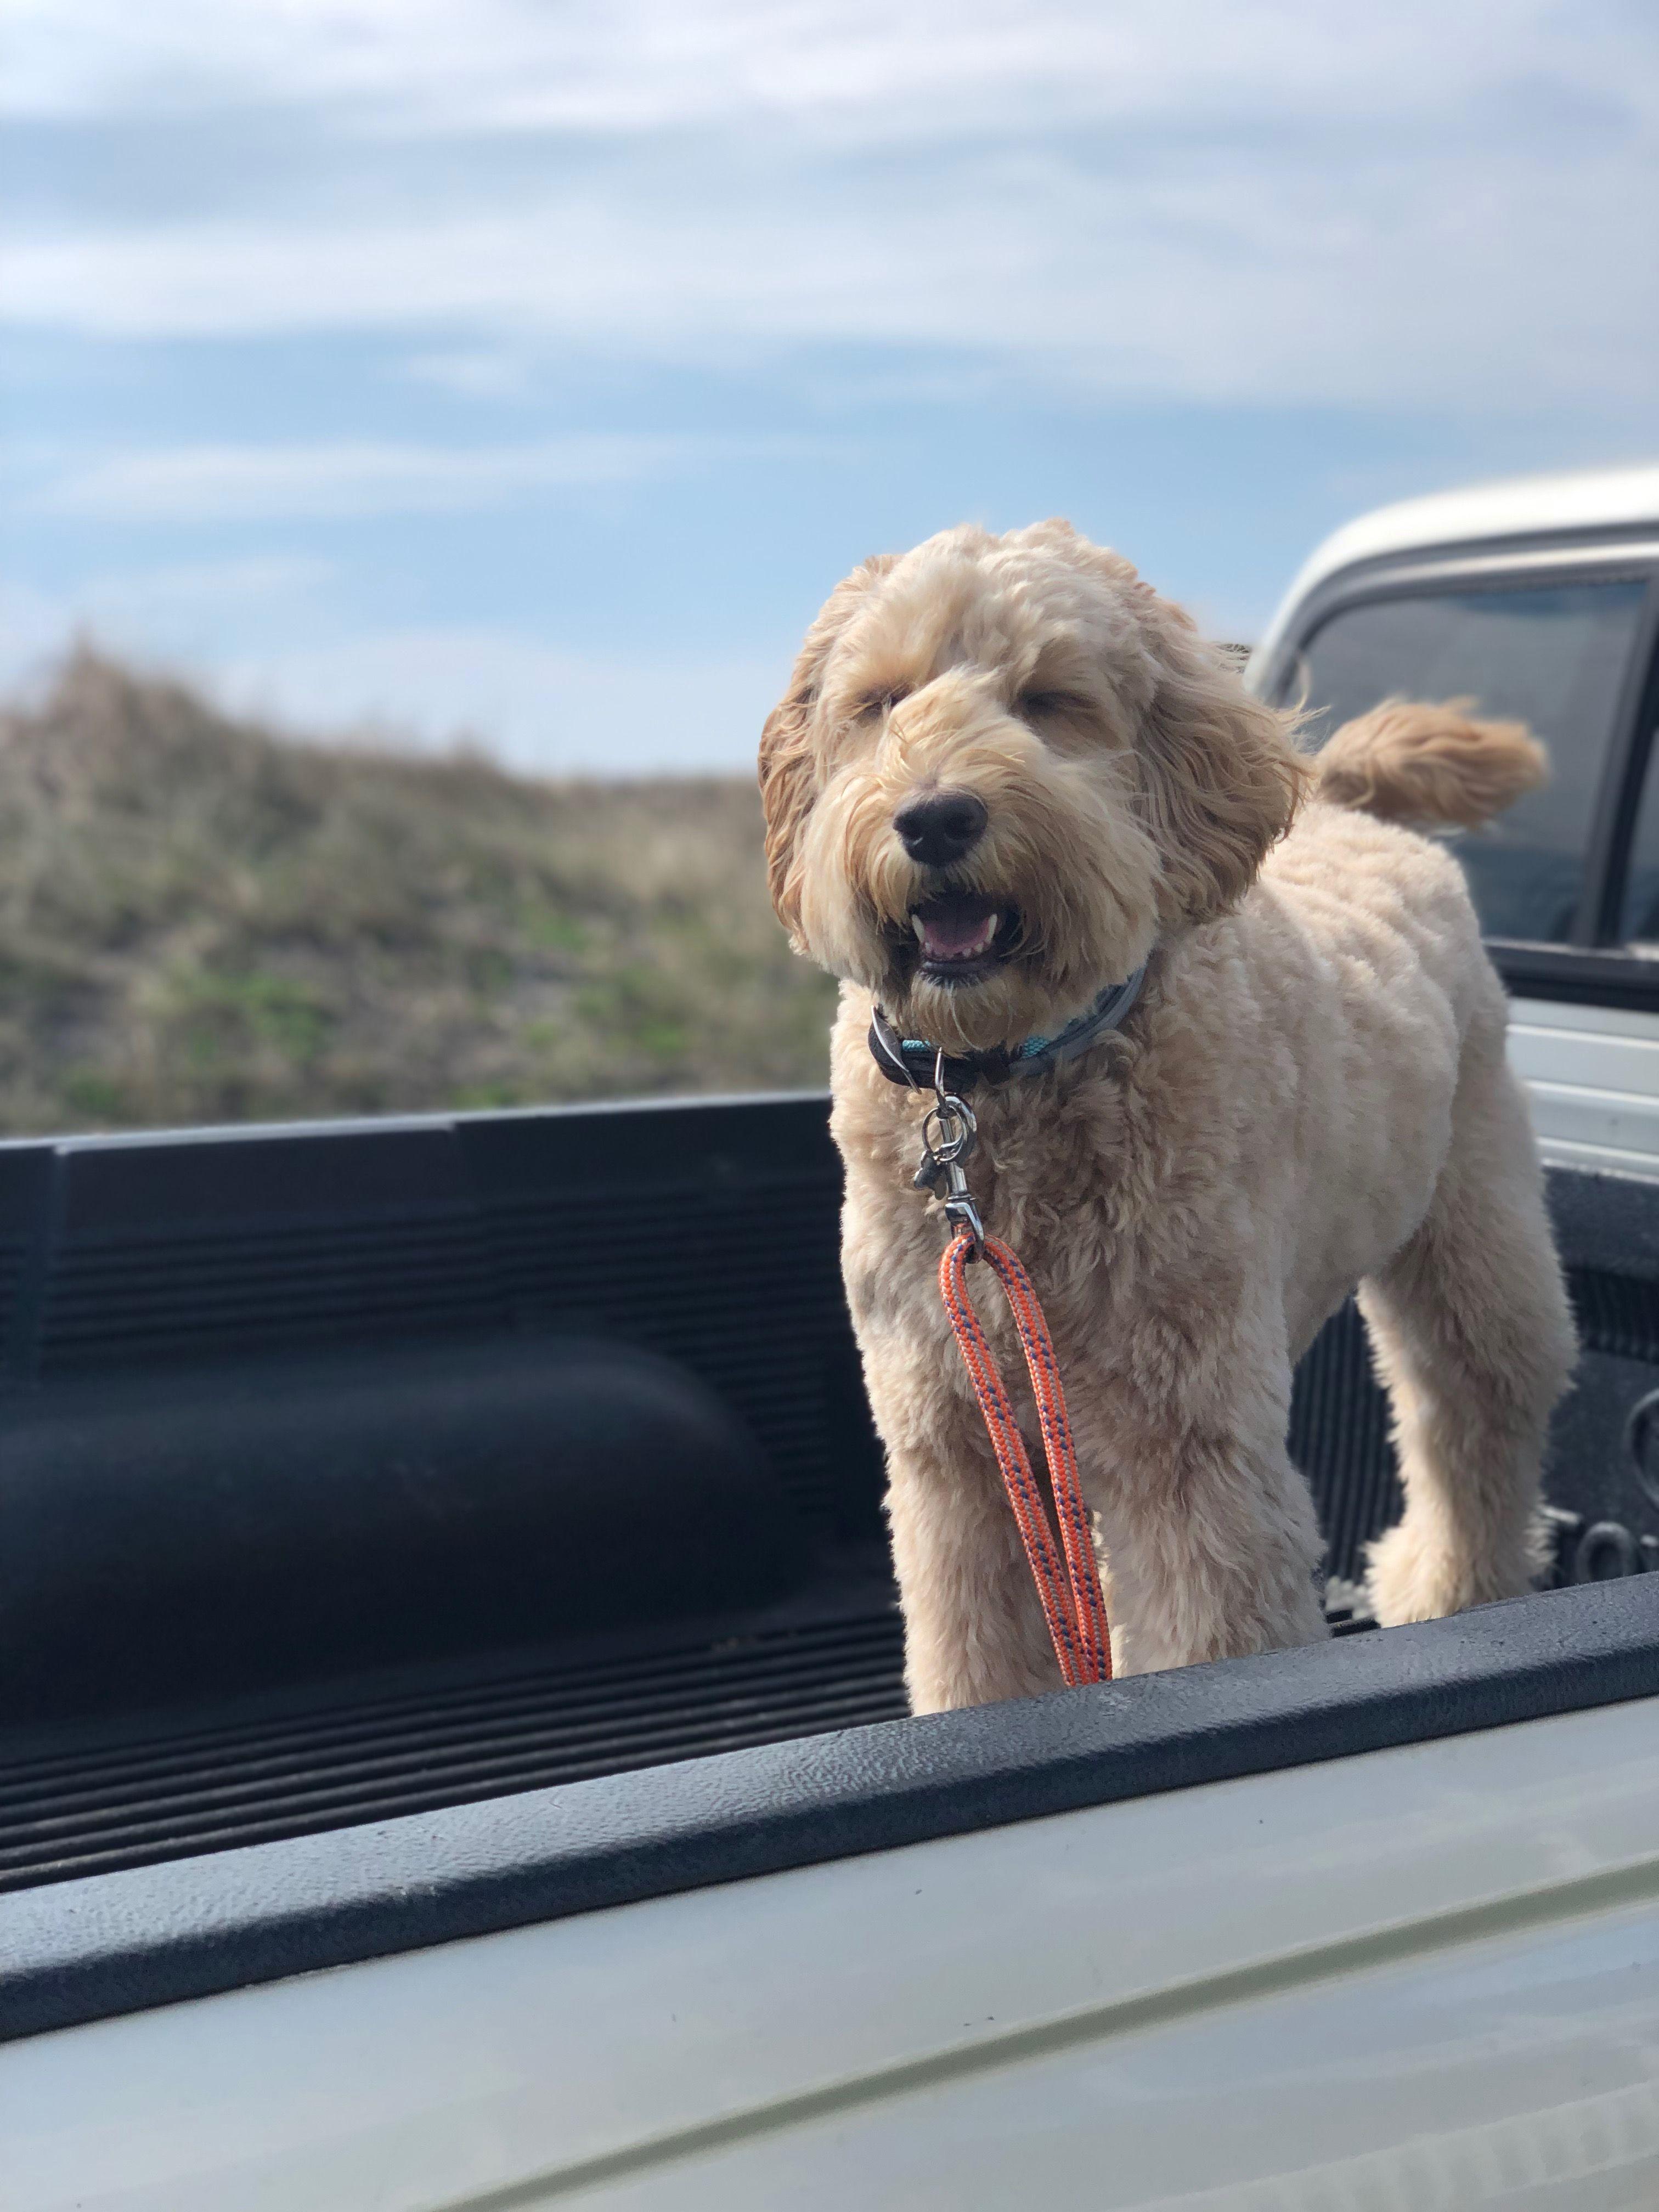 Rope Leash Dogs Girl Dog Dog Leash